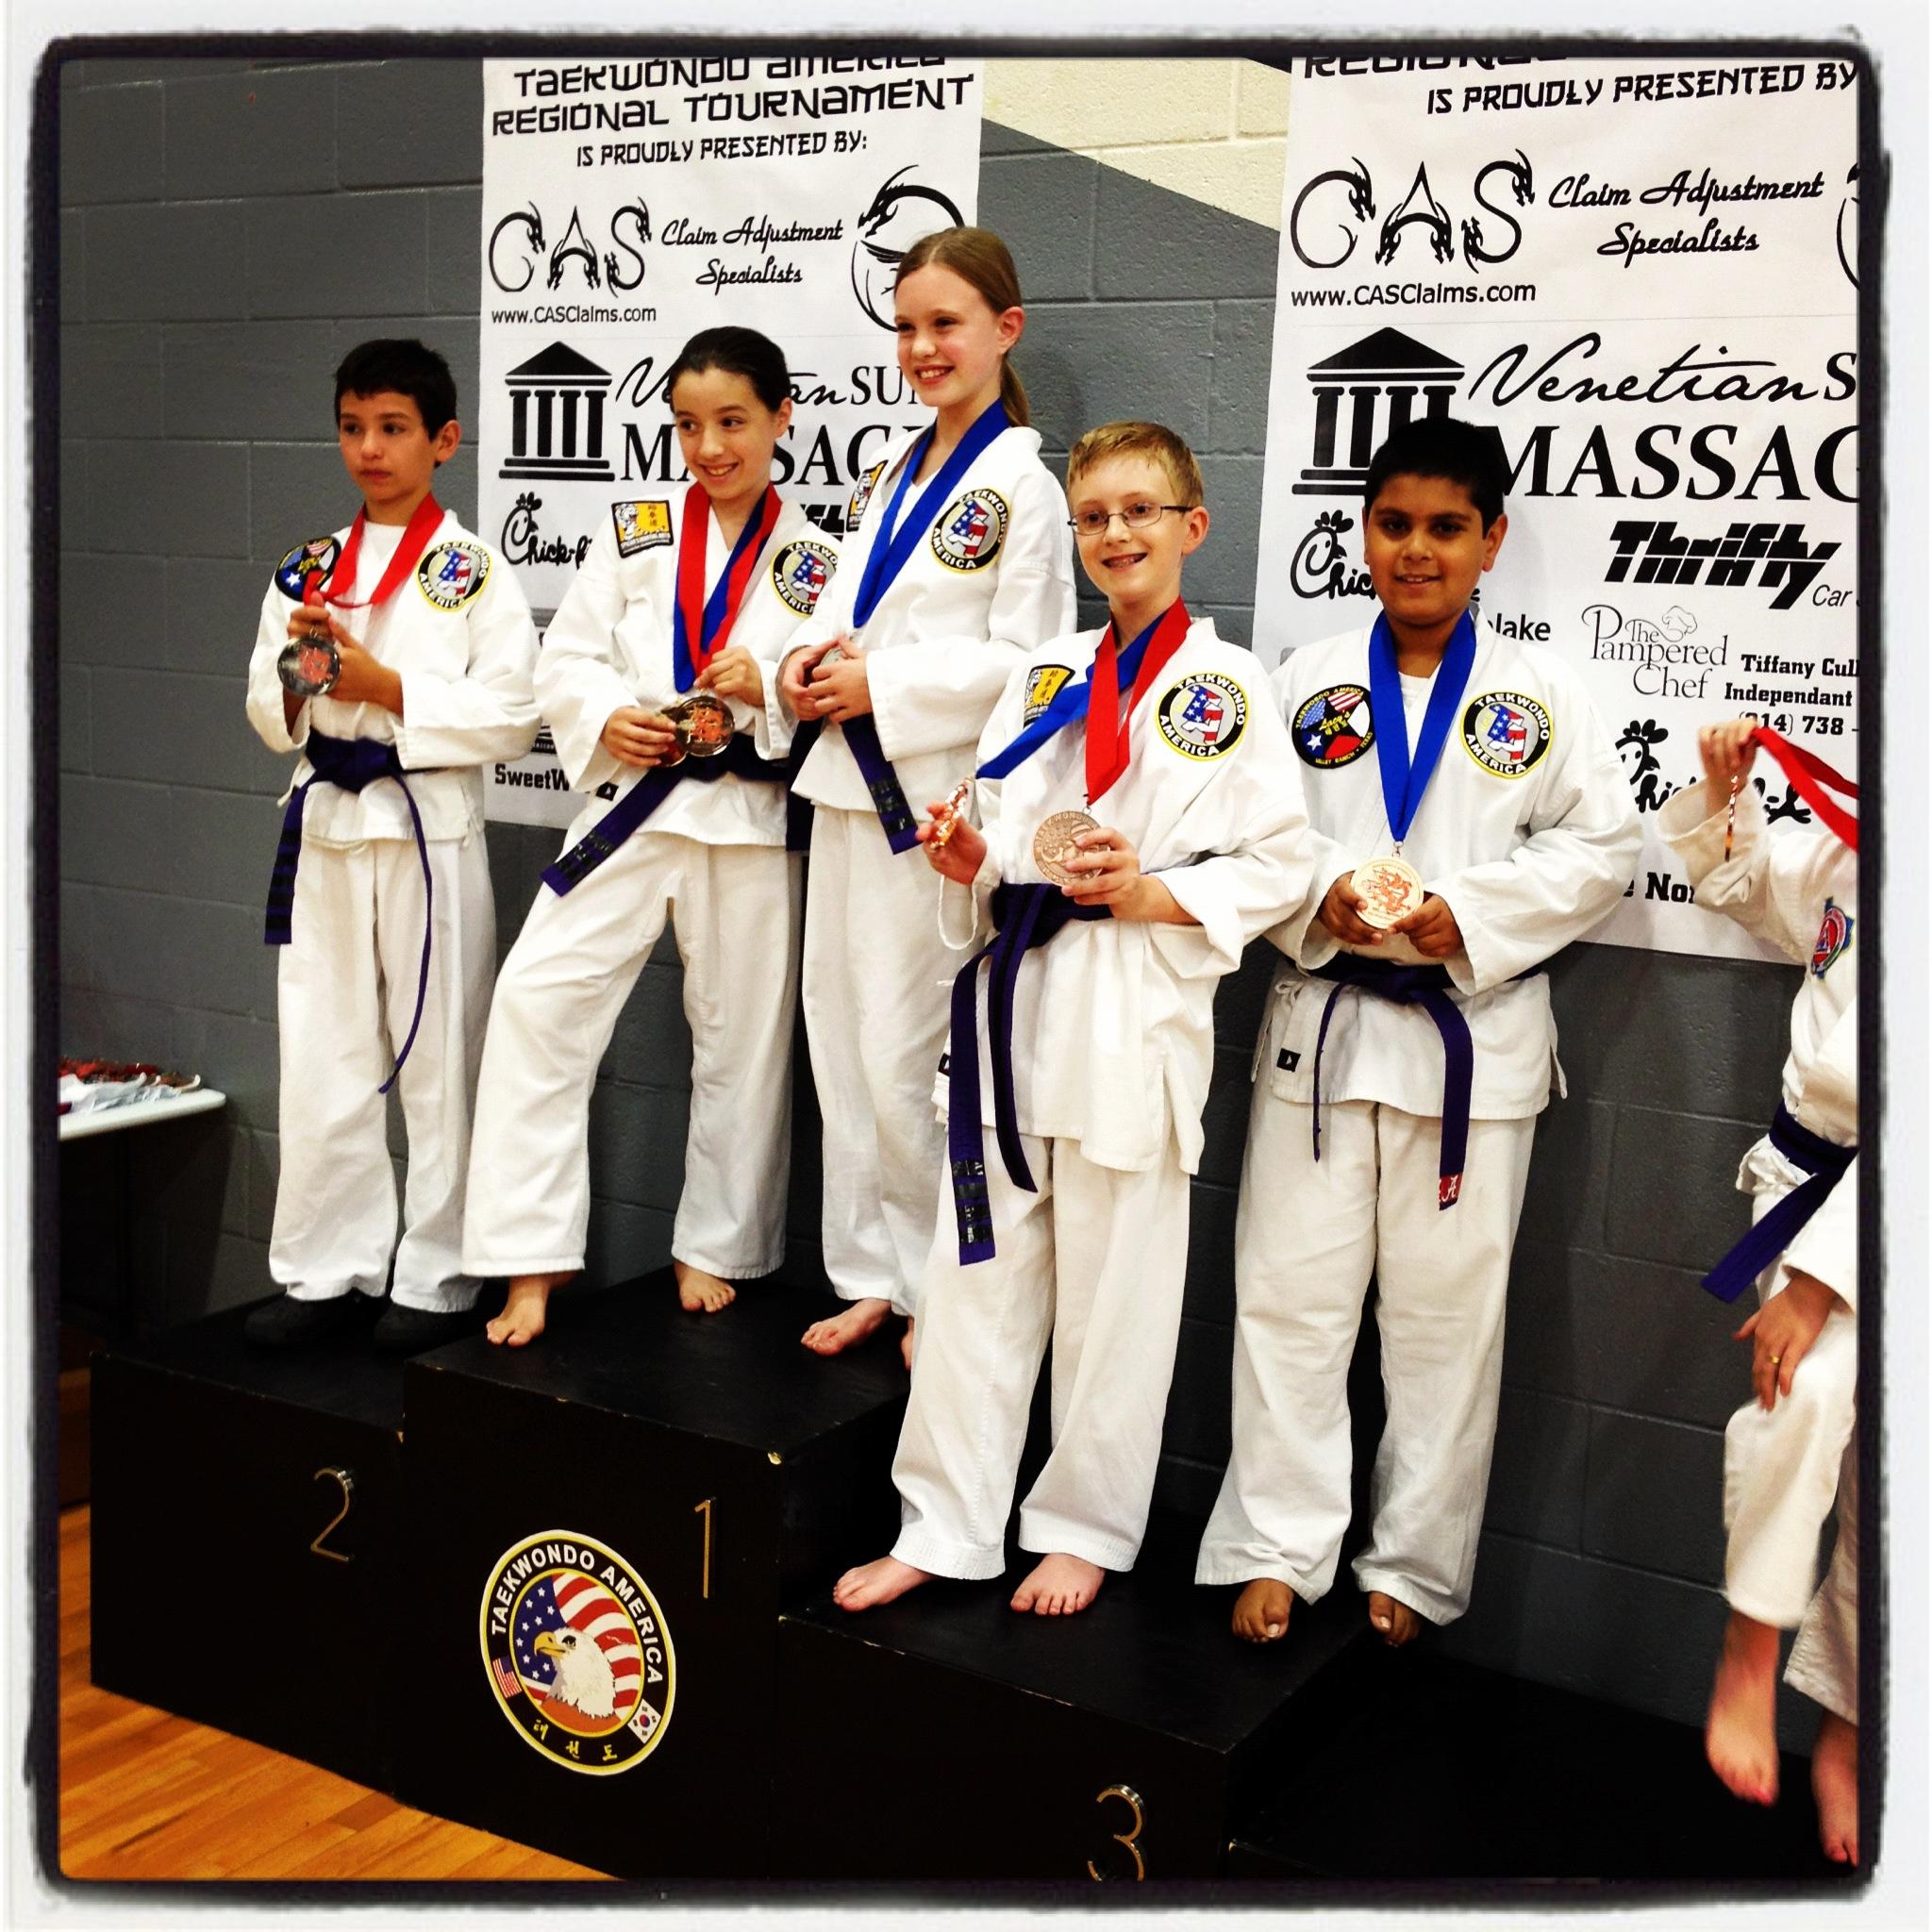 Taekwondo Students From Southlake TX At Tournament.jpg